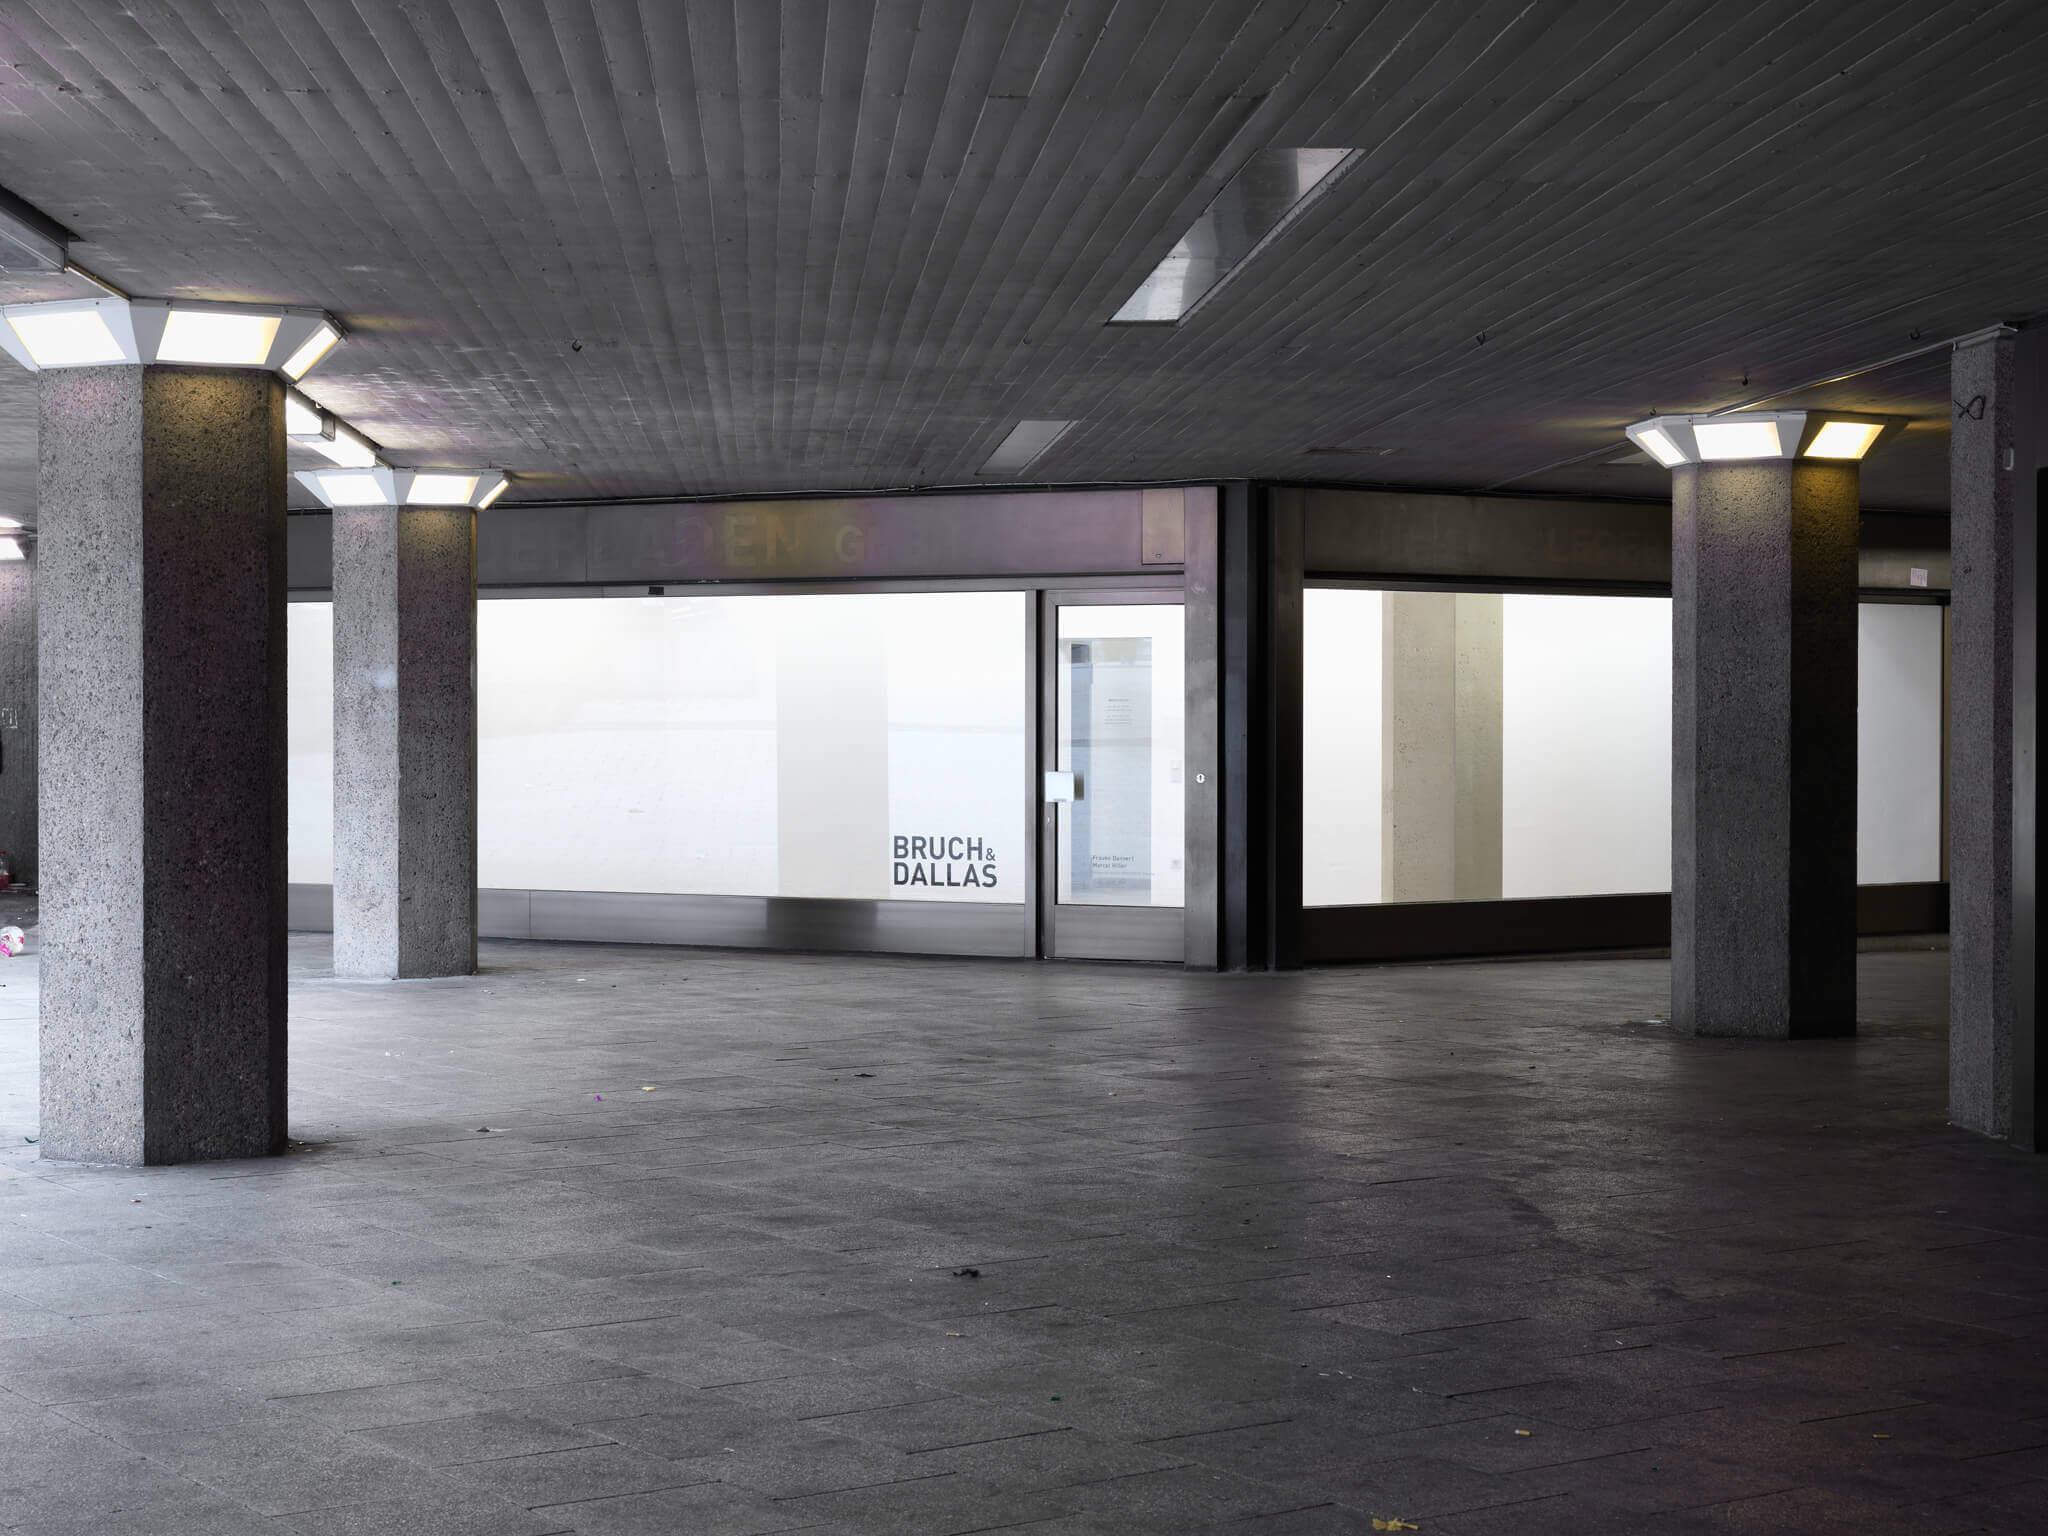 20140304_Frauke Dannert_Installation_0001 Kopie